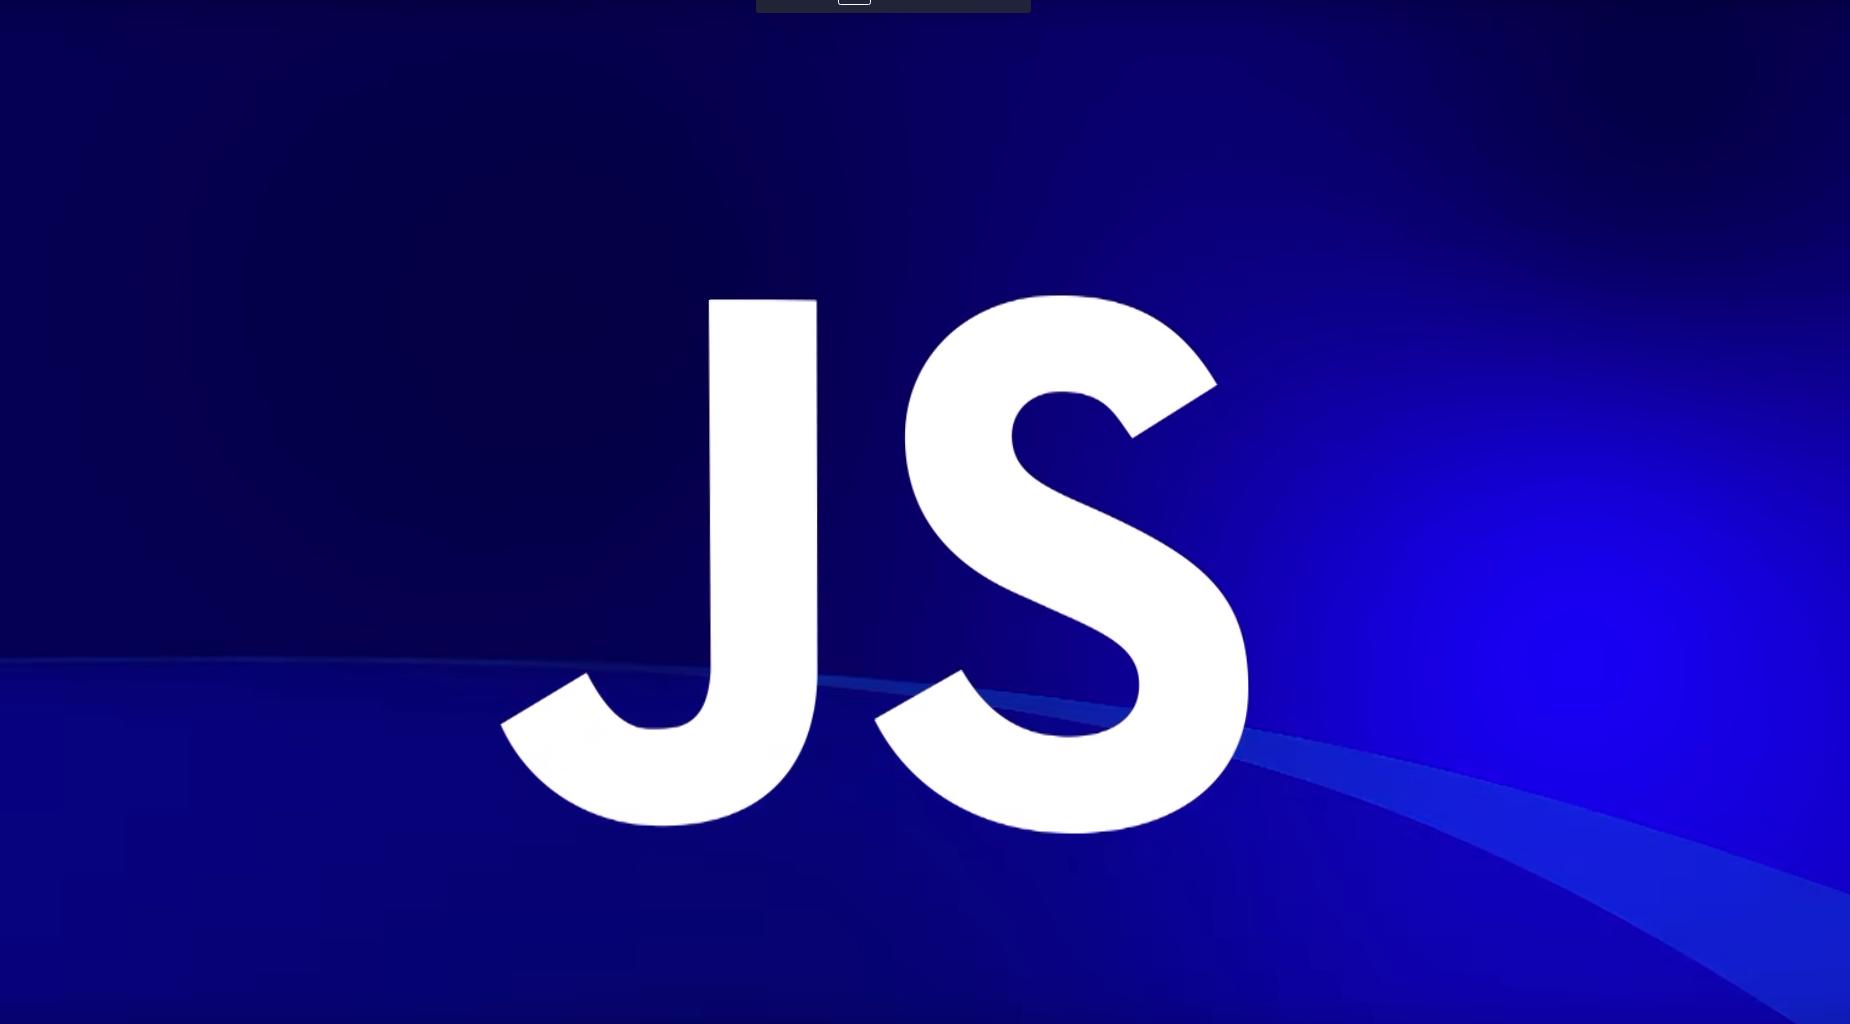 Matteo Collina: My Node.JS Process Is On Fire - JSConf.Asia 2018